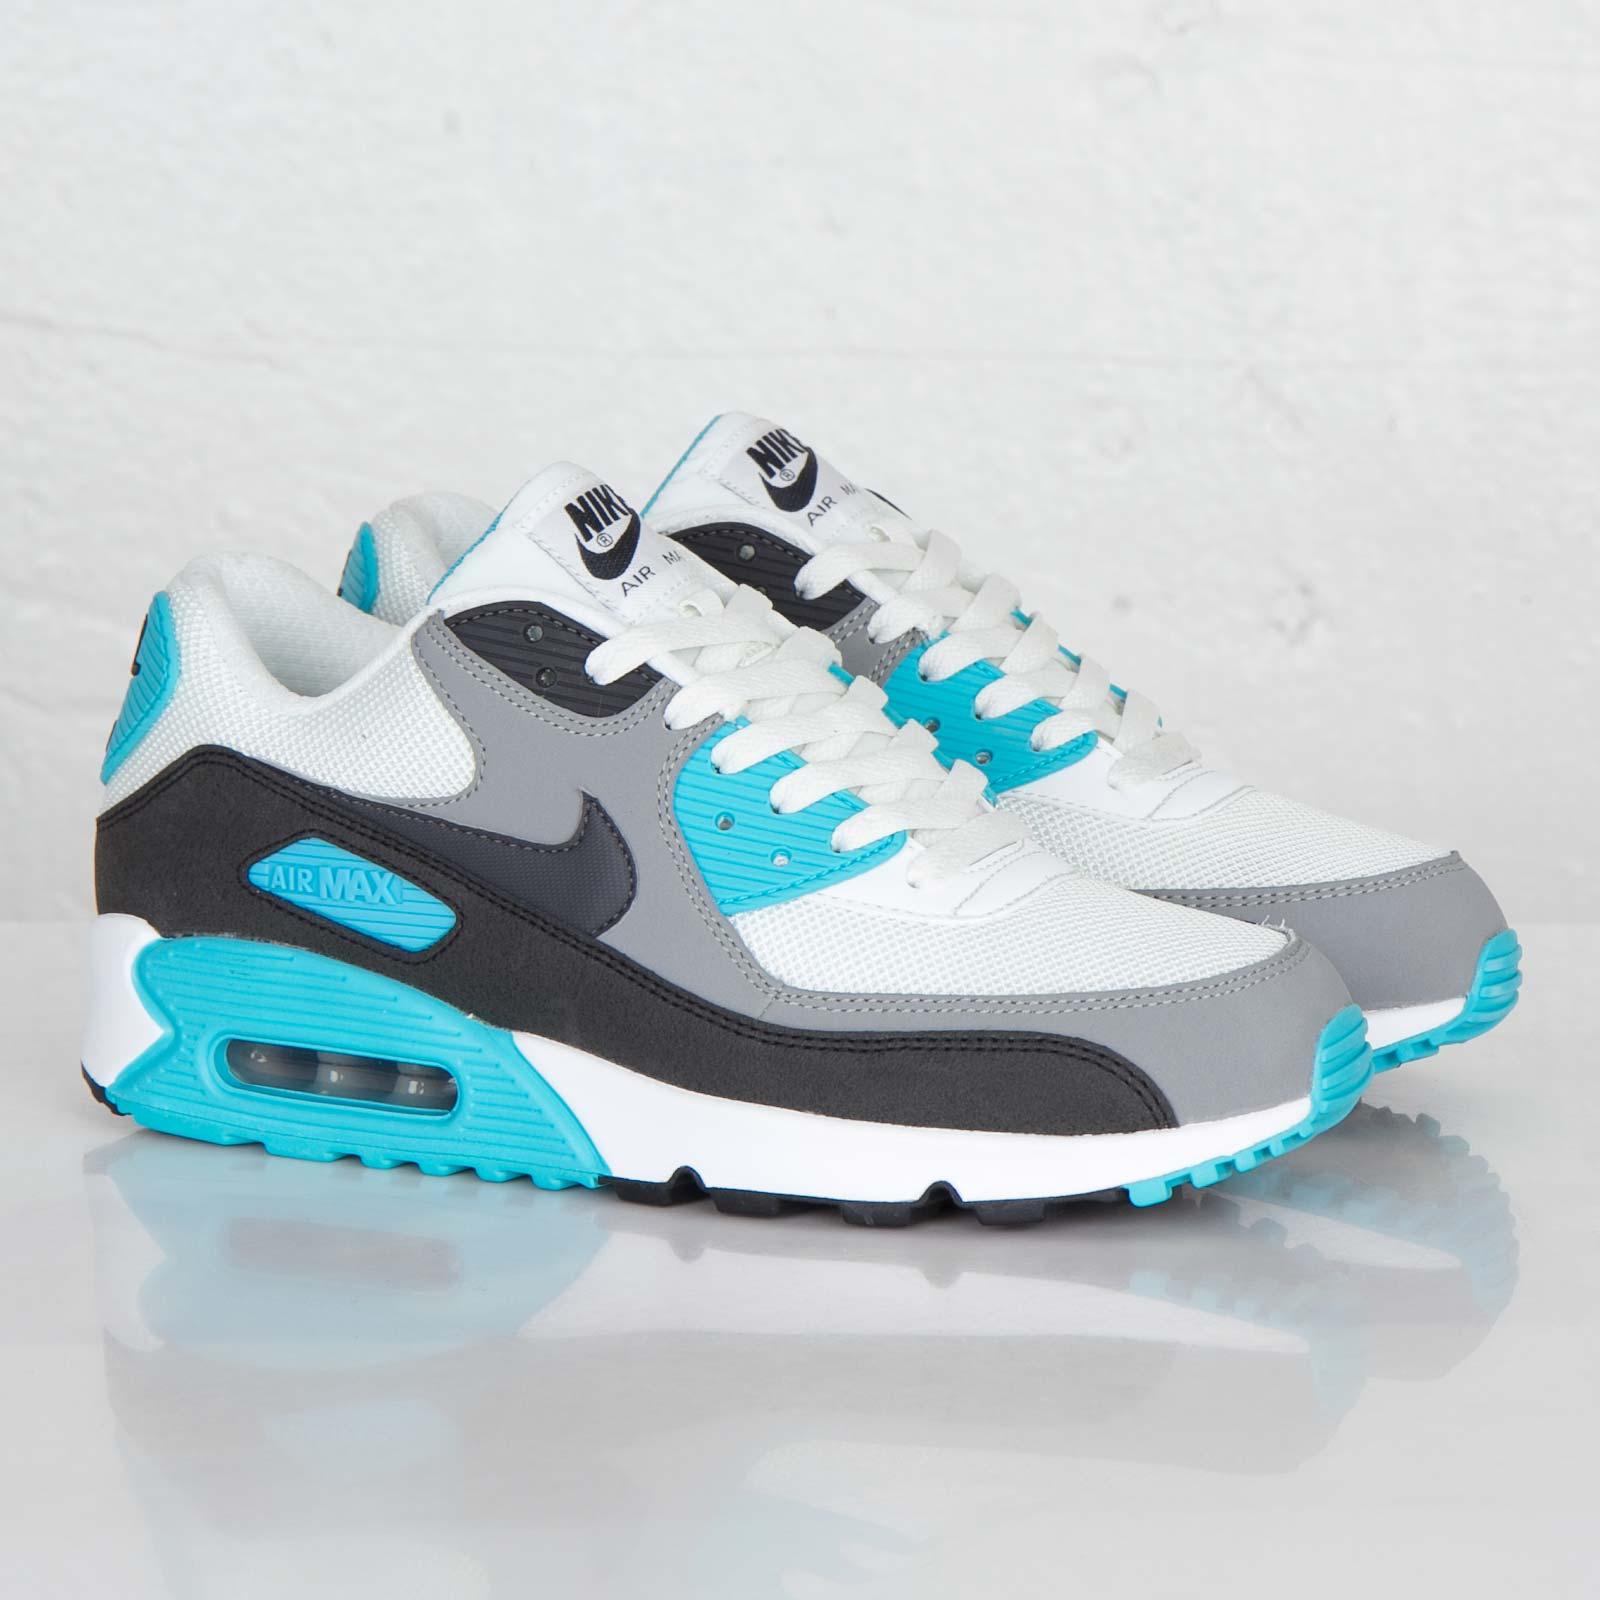 cheaper 75085 7e3ef Nike Air Max 90 Essential - 537384-100 - Sneakersnstuff ...